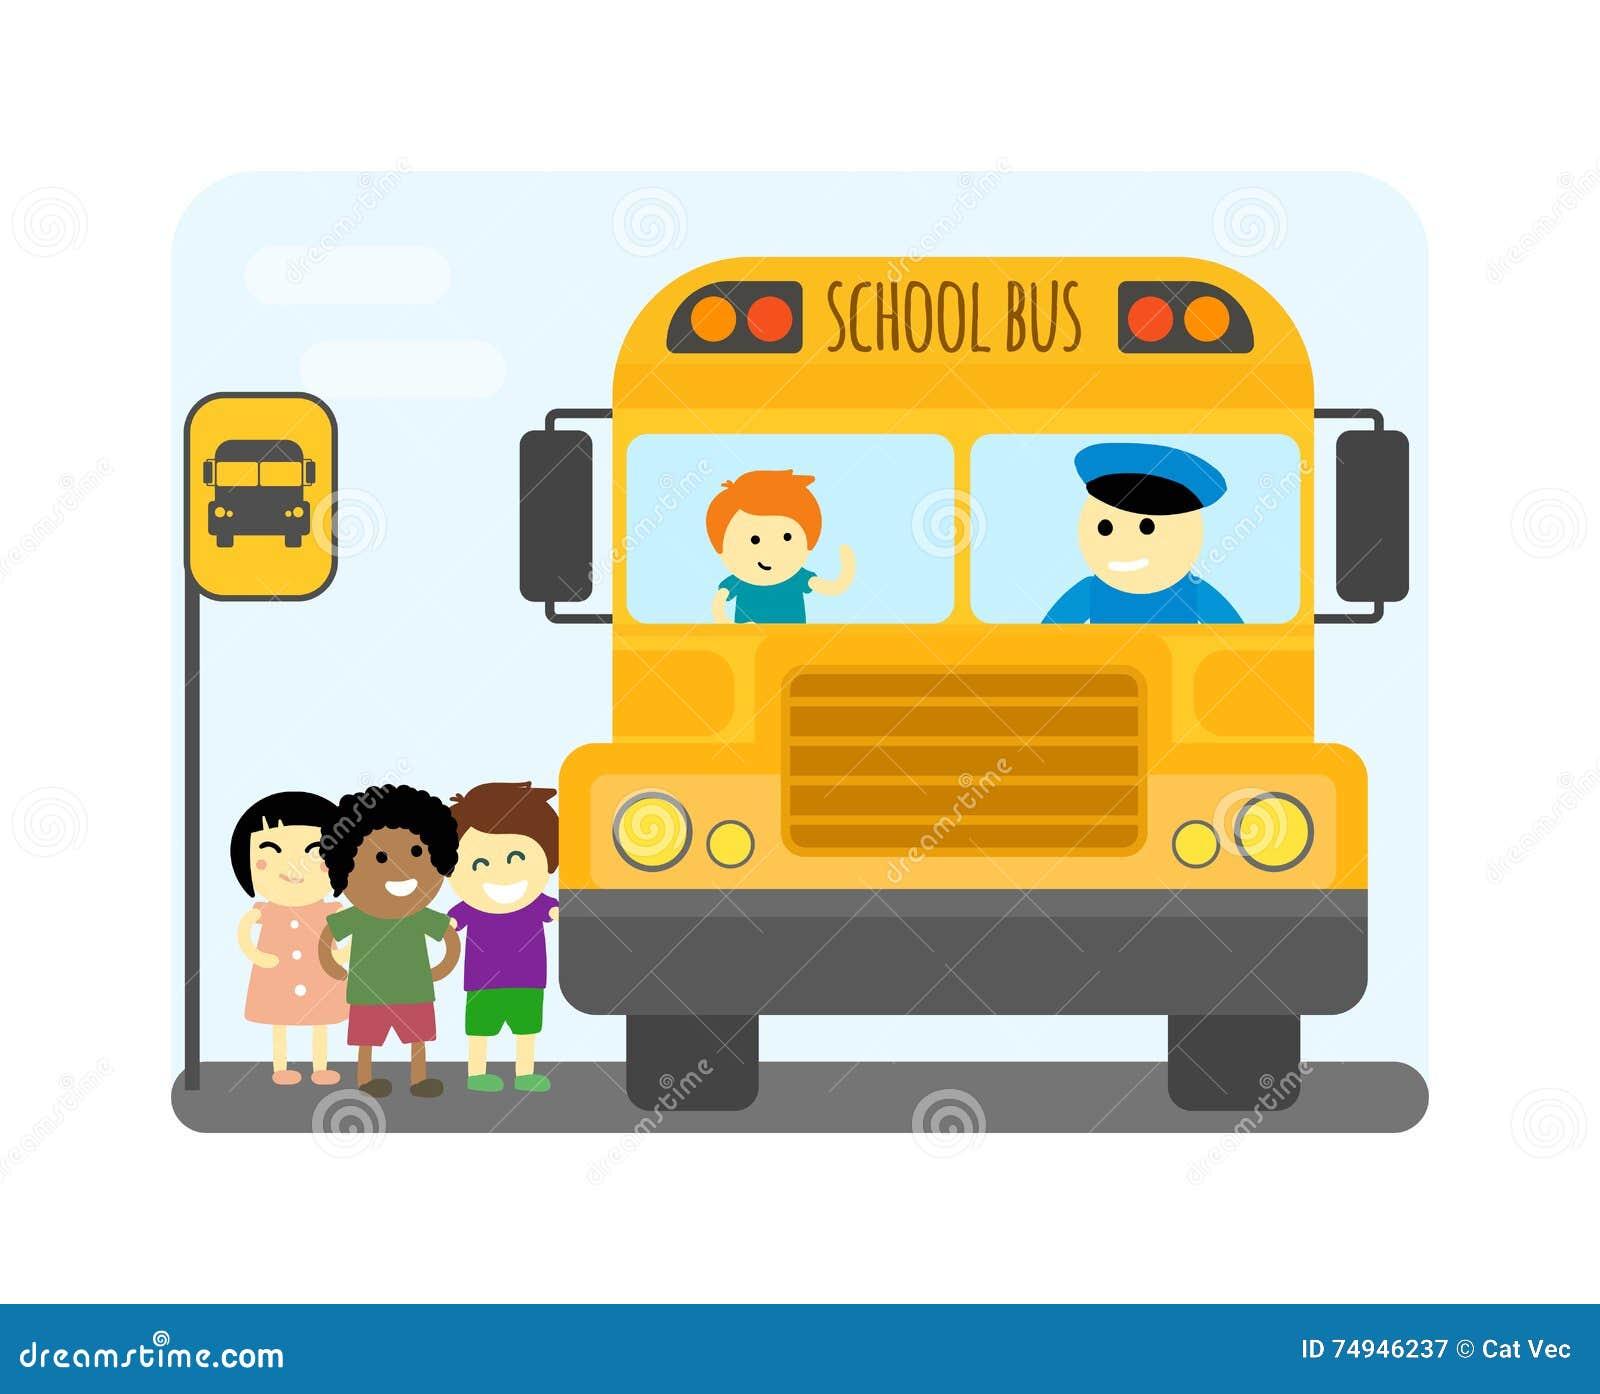 School Bus Safety Stock Photography | CartoonDealer.com ...